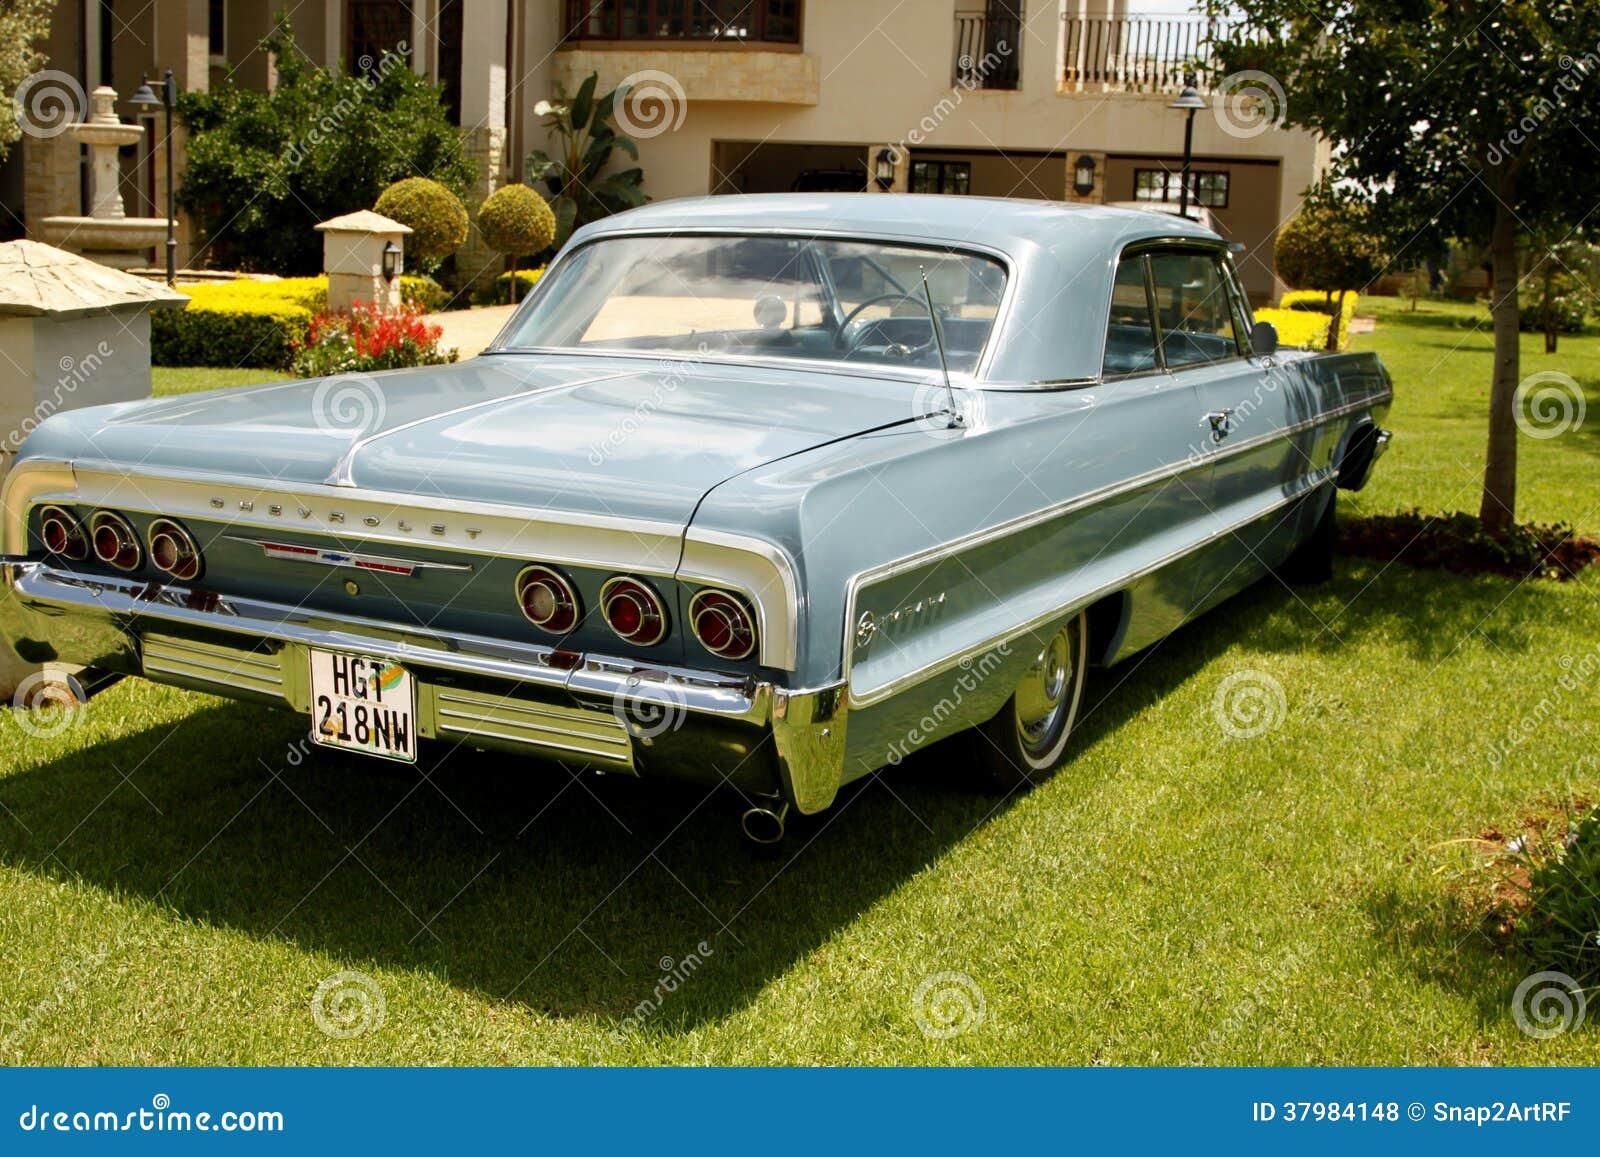 Kekurangan Chevrolet Impala 1964 Spesifikasi